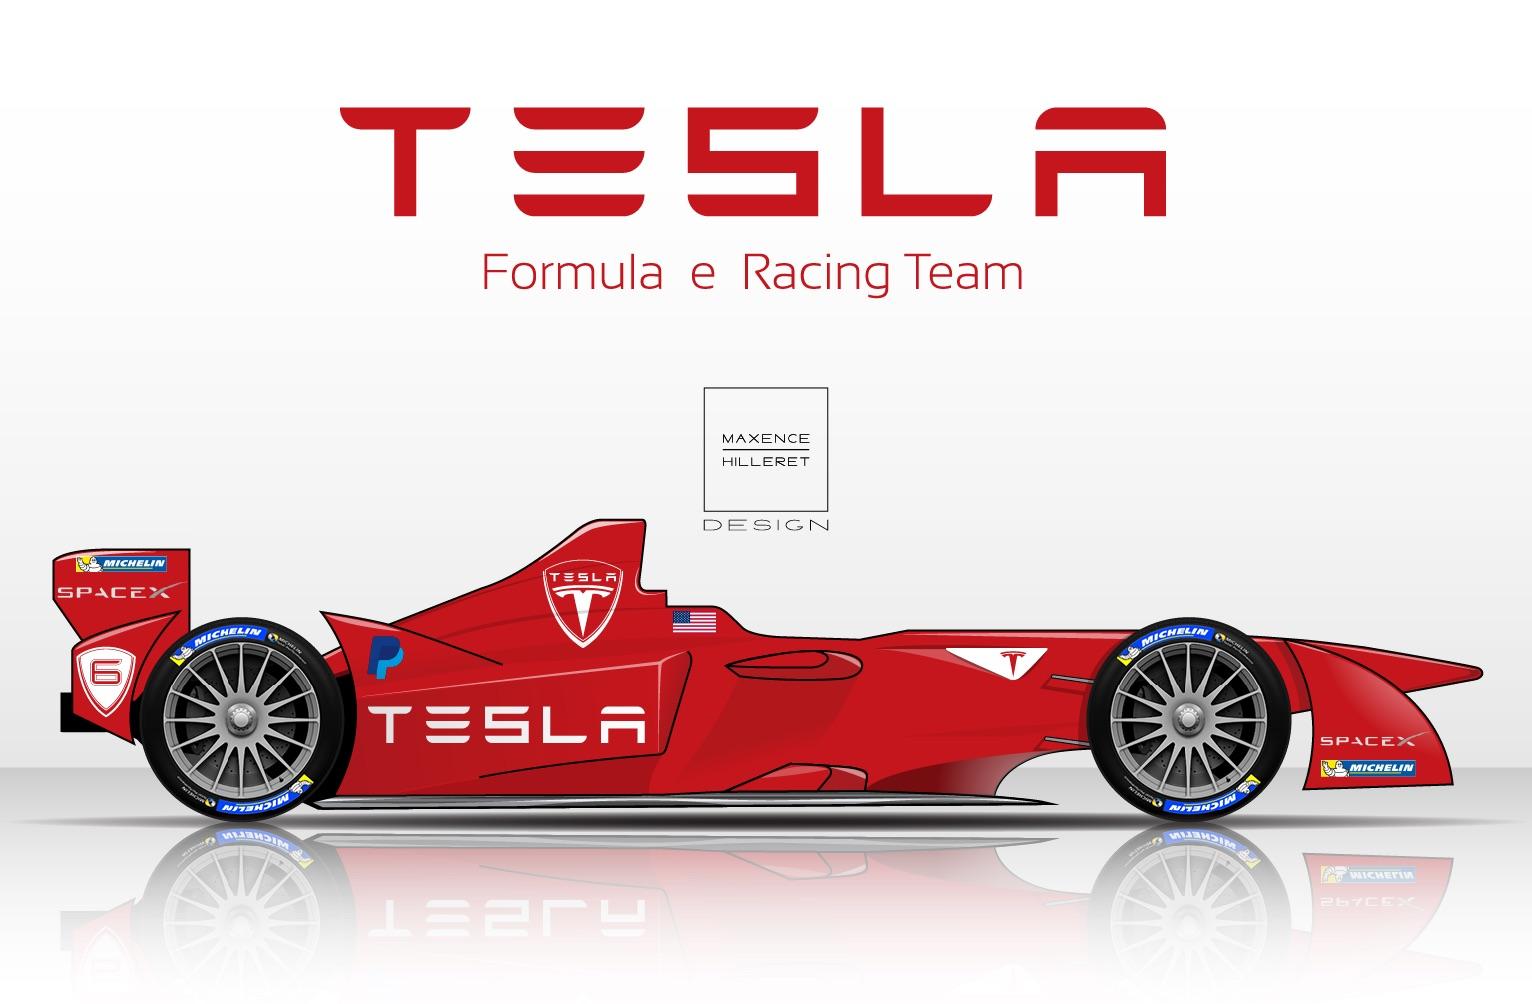 Tesla Service Centers Embrace F1 Racing Approach